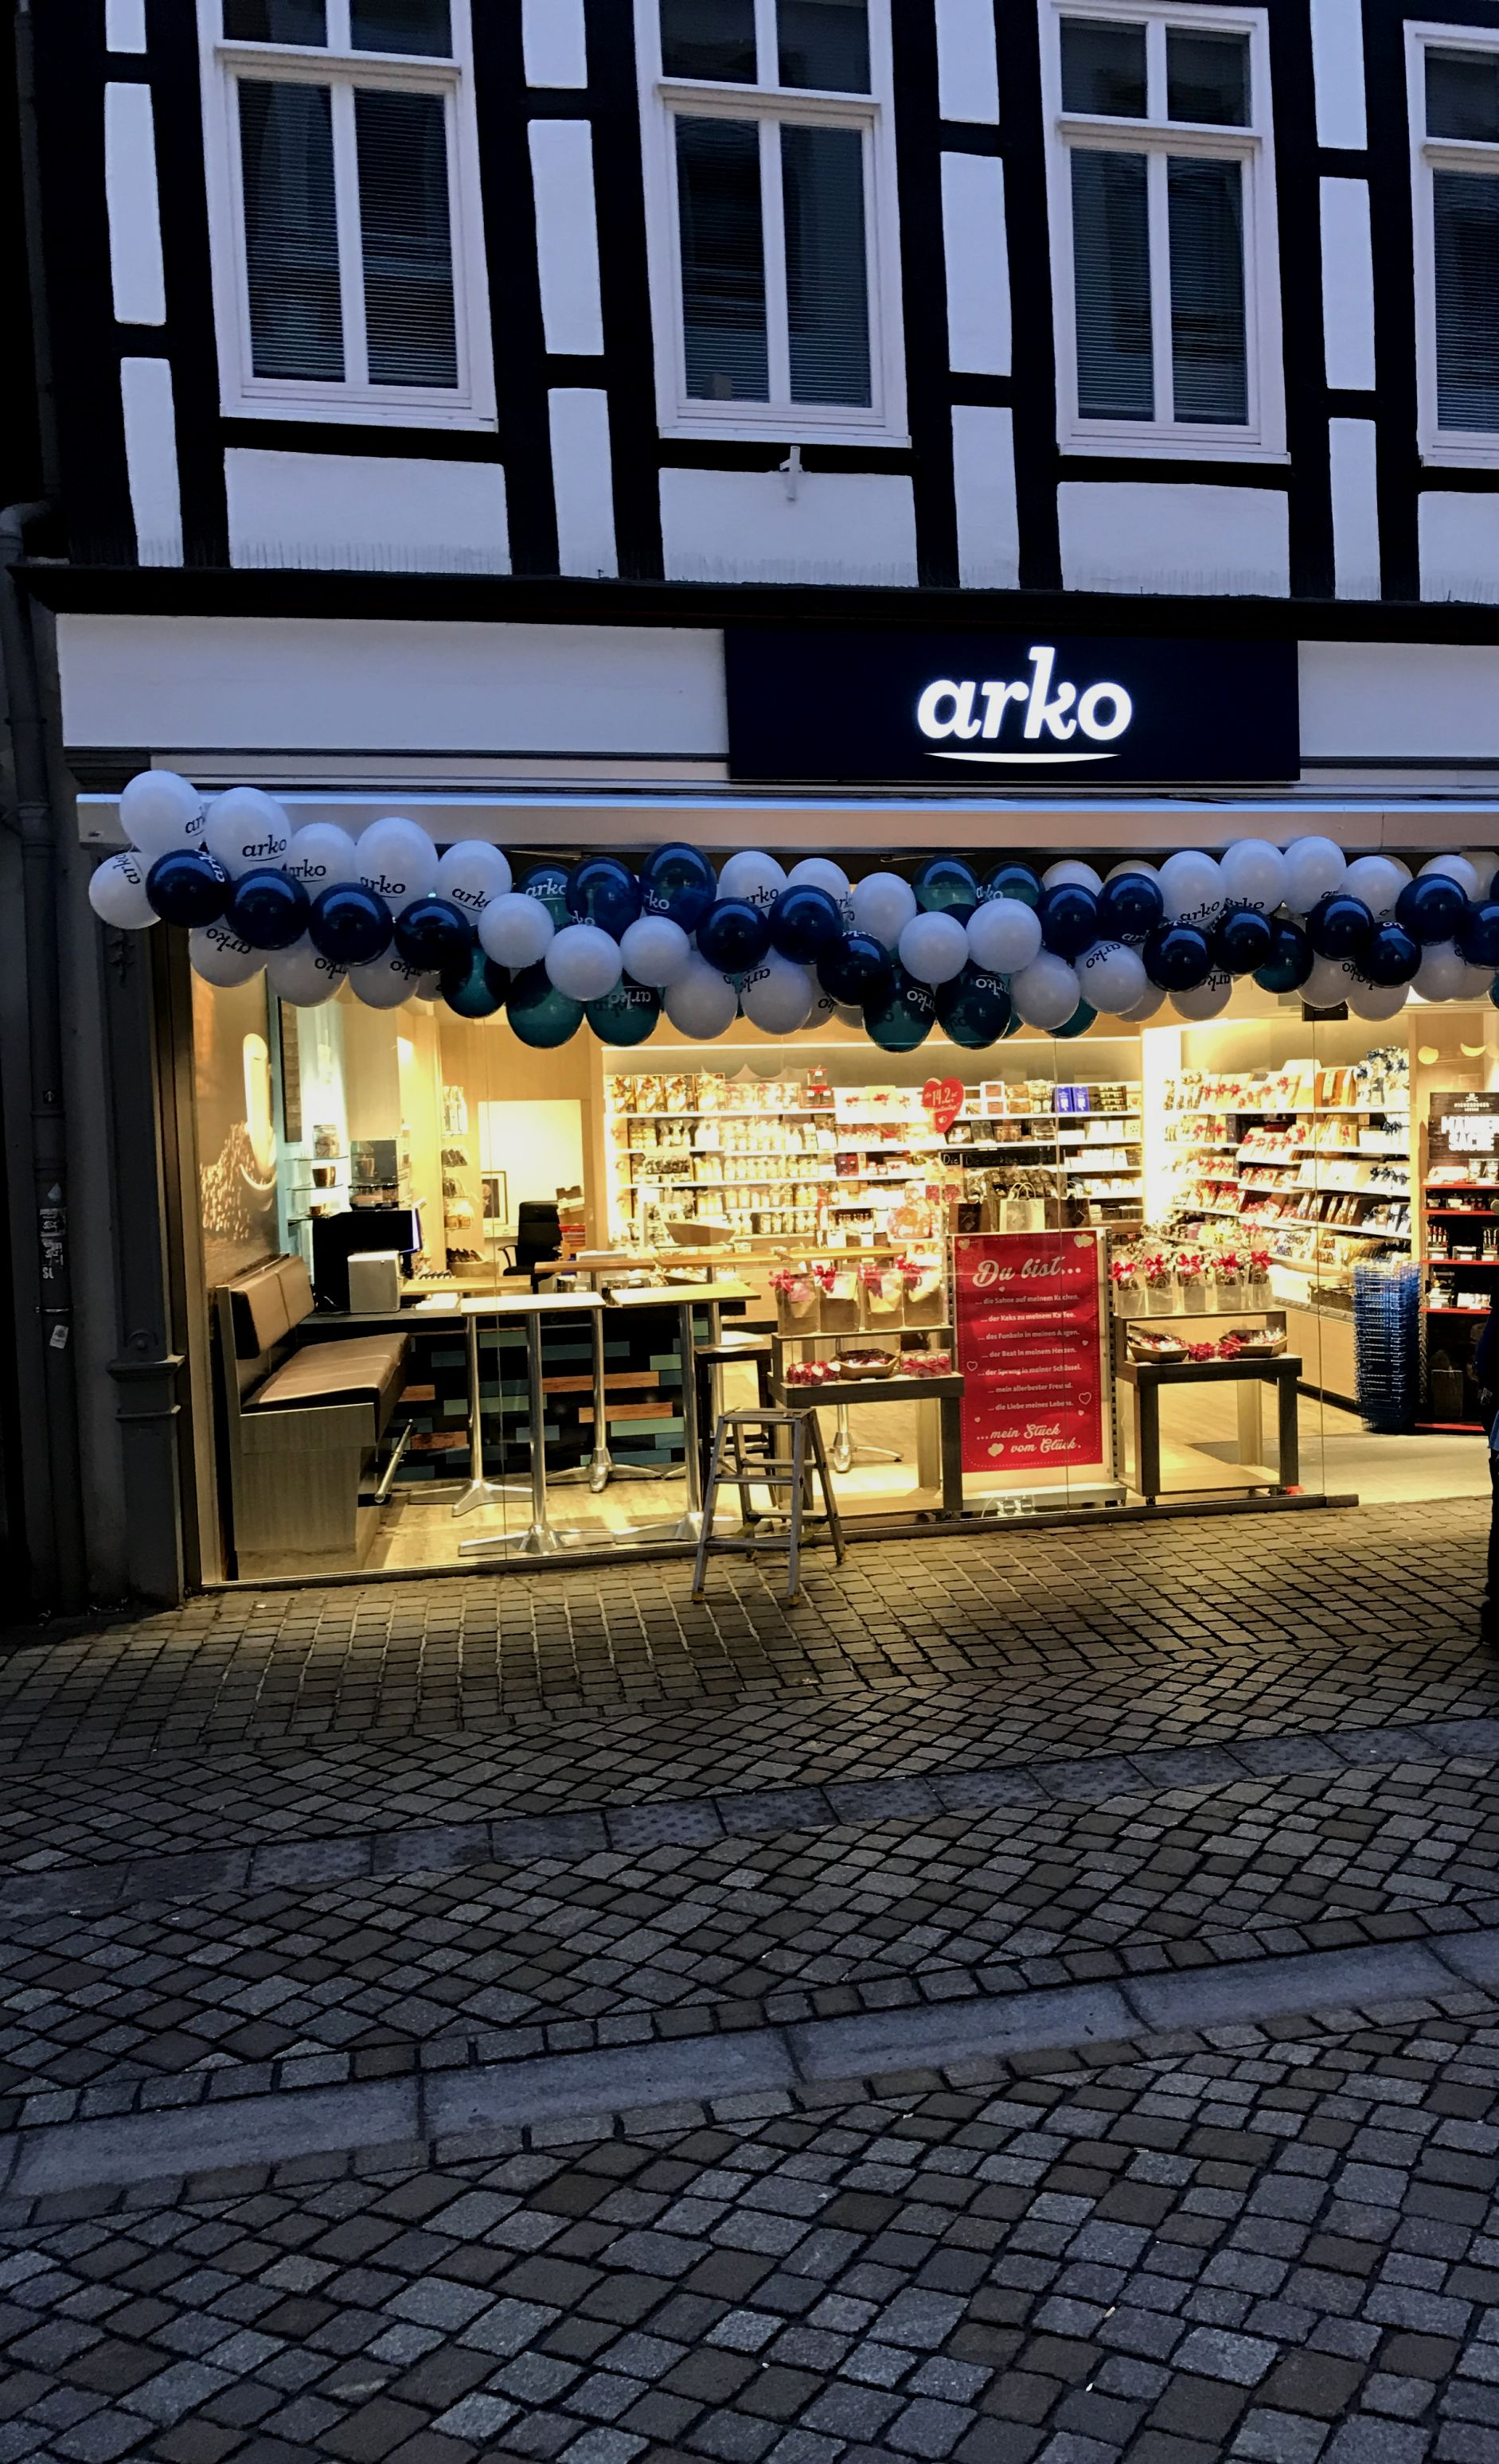 Arko-Franchise Bettina Dreyer